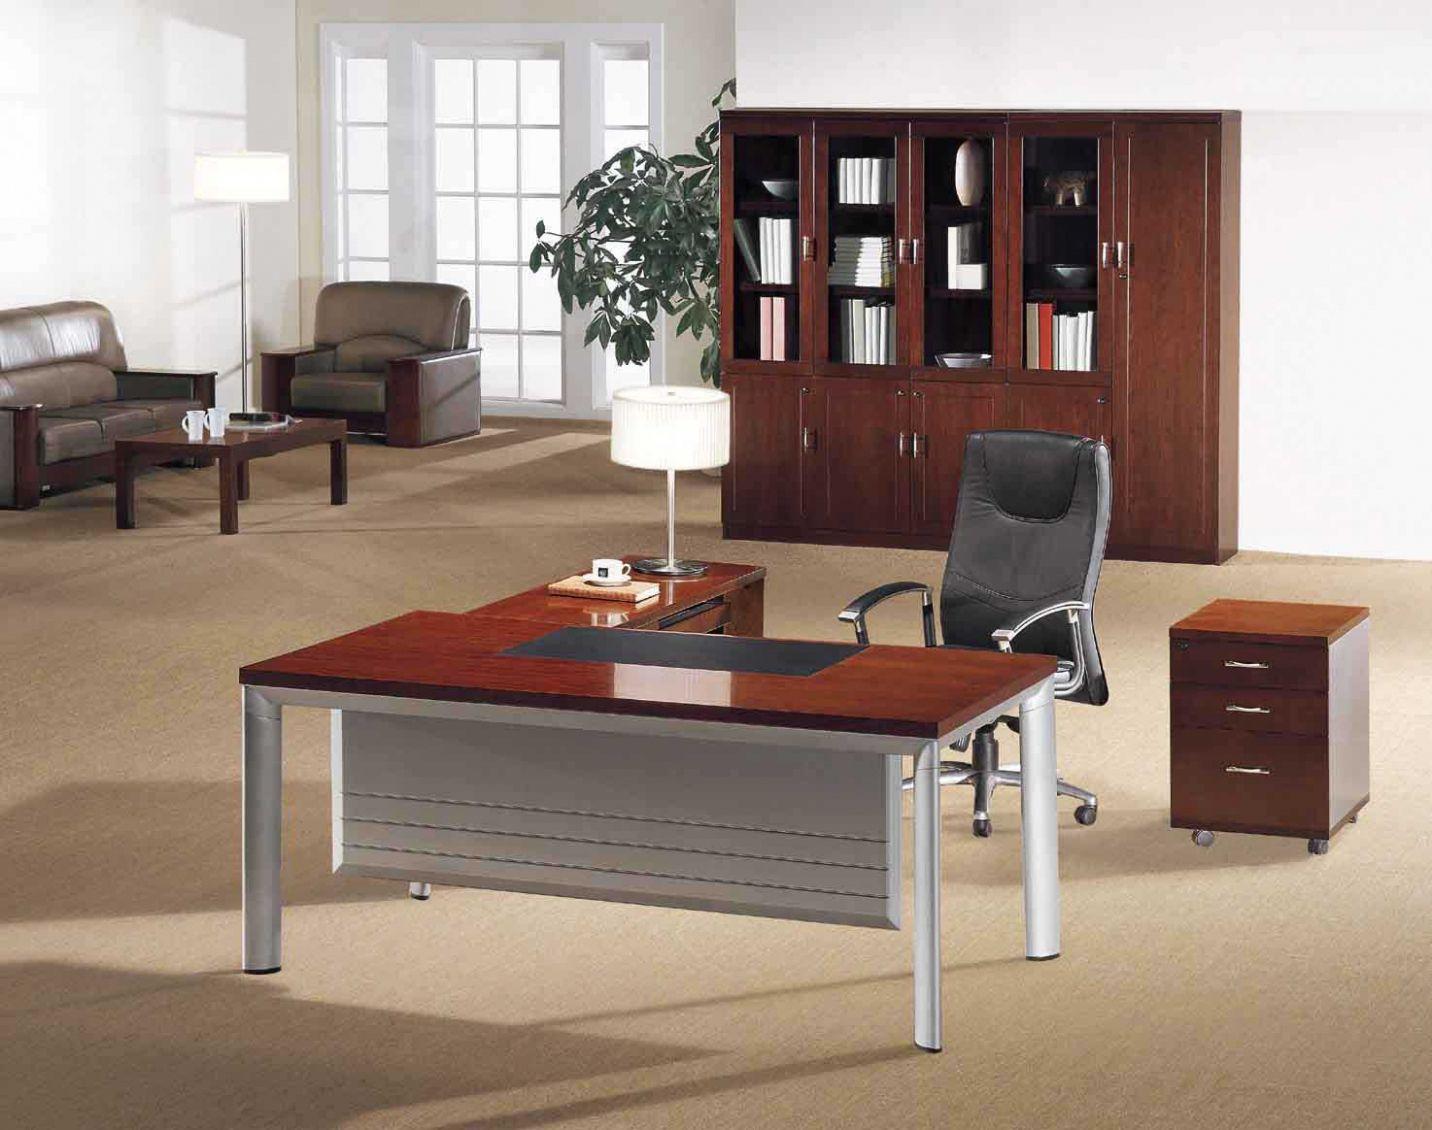 Home office desk wooden top affordable modern furniture home